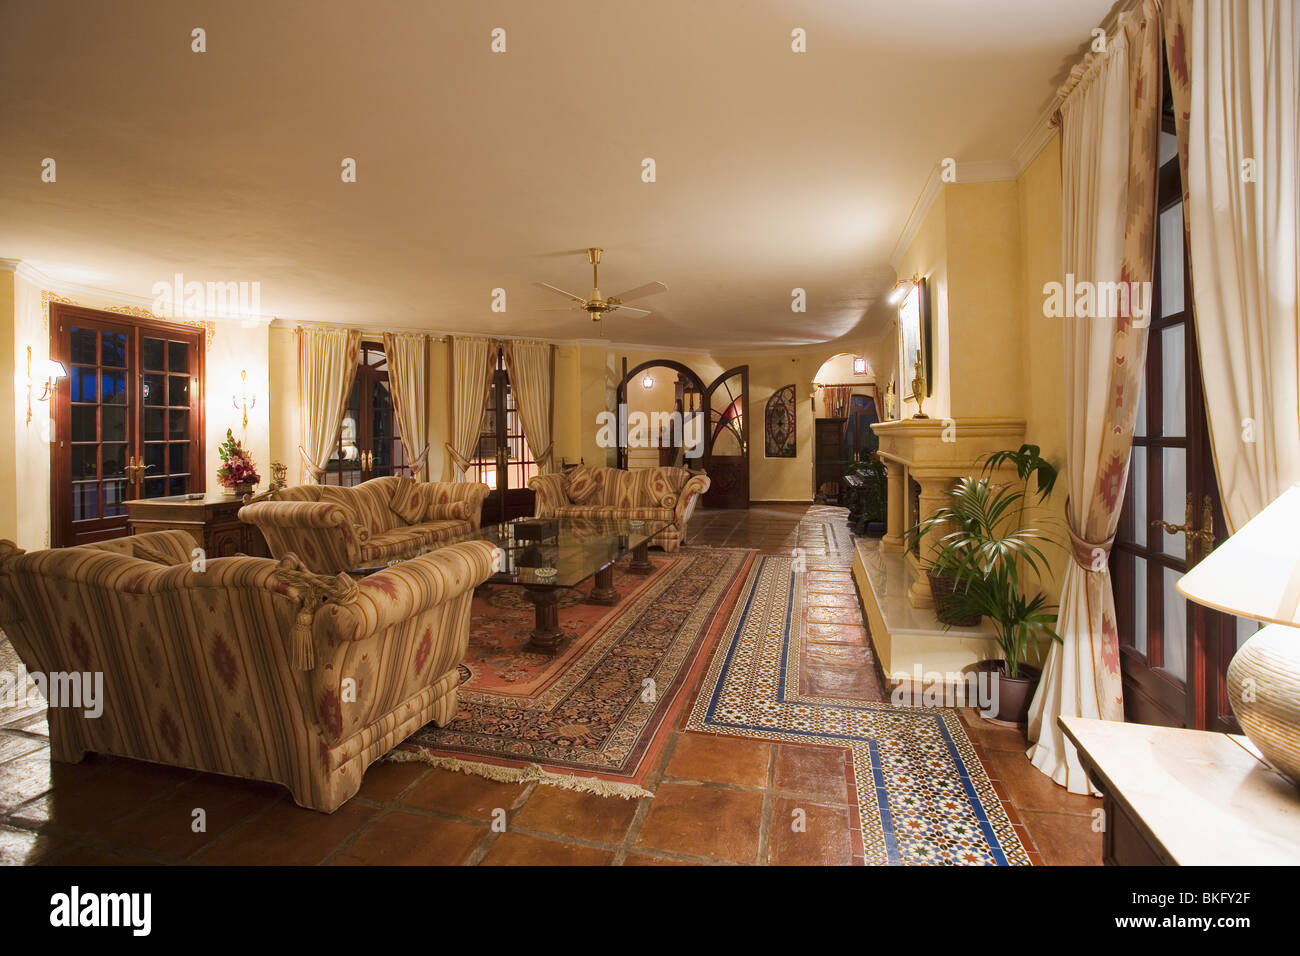 Interiors traditional living rooms floors stockfotos interiors traditional living rooms floors - Marokkanische bodenfliesen ...